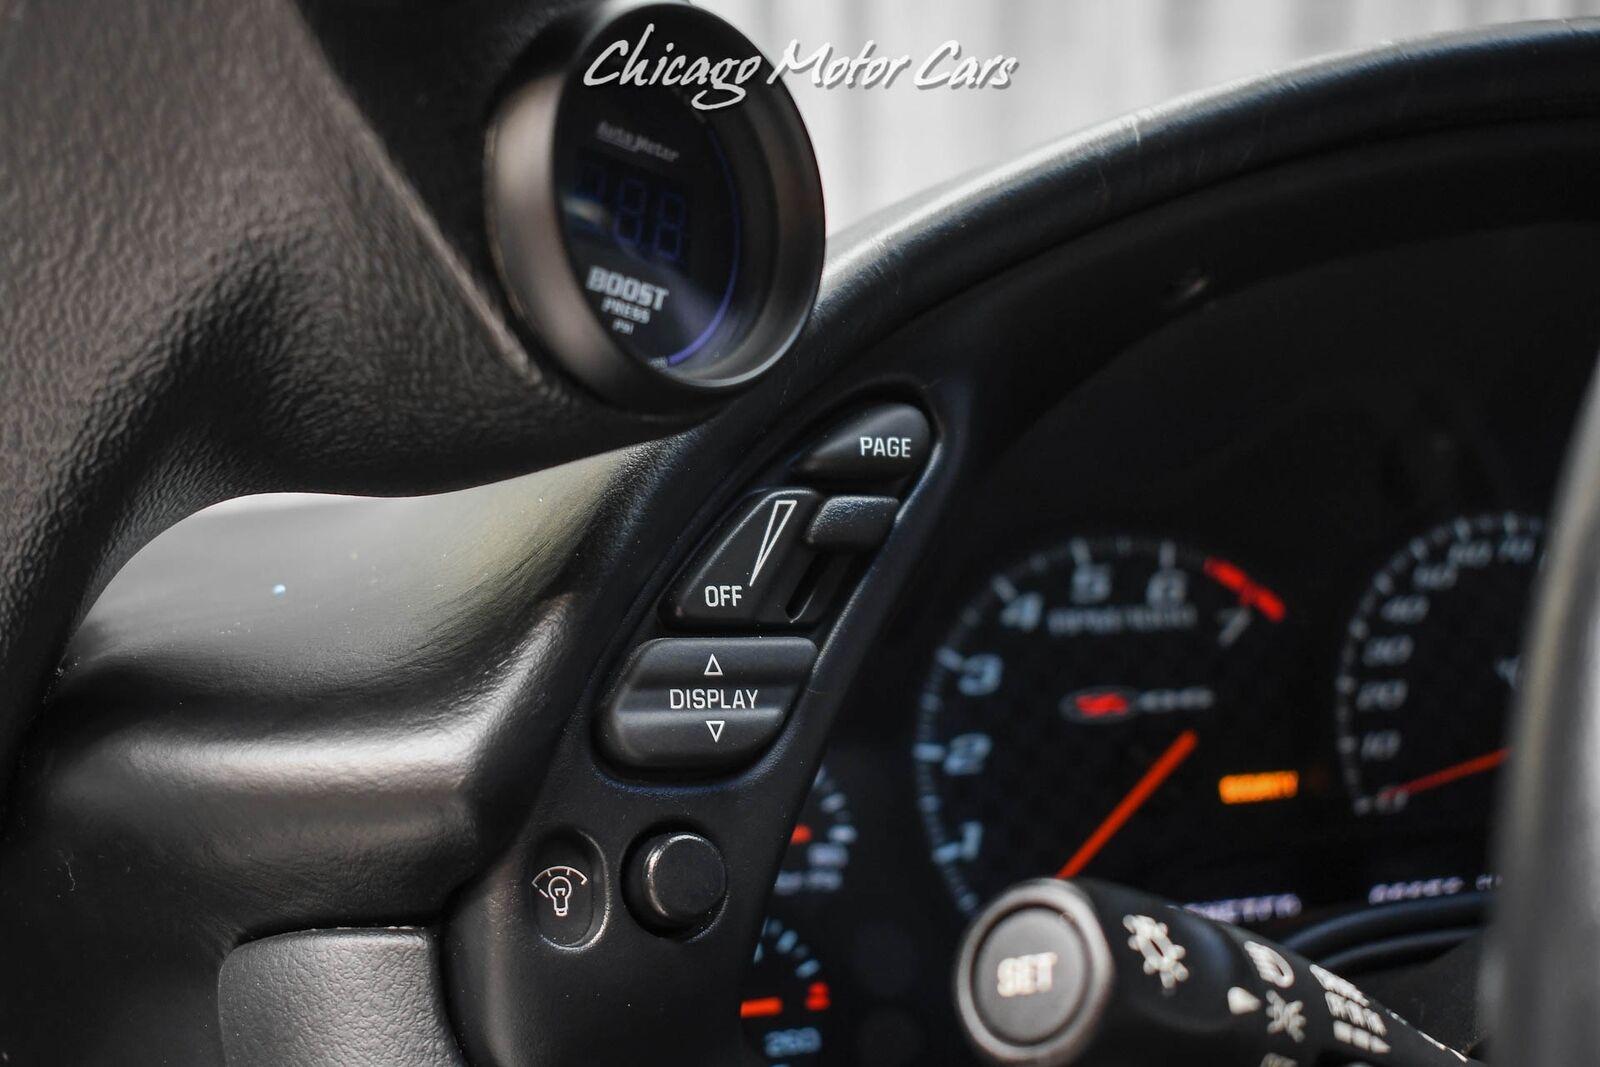 2003 Black Chevrolet Corvette Z06  | C5 Corvette Photo 9